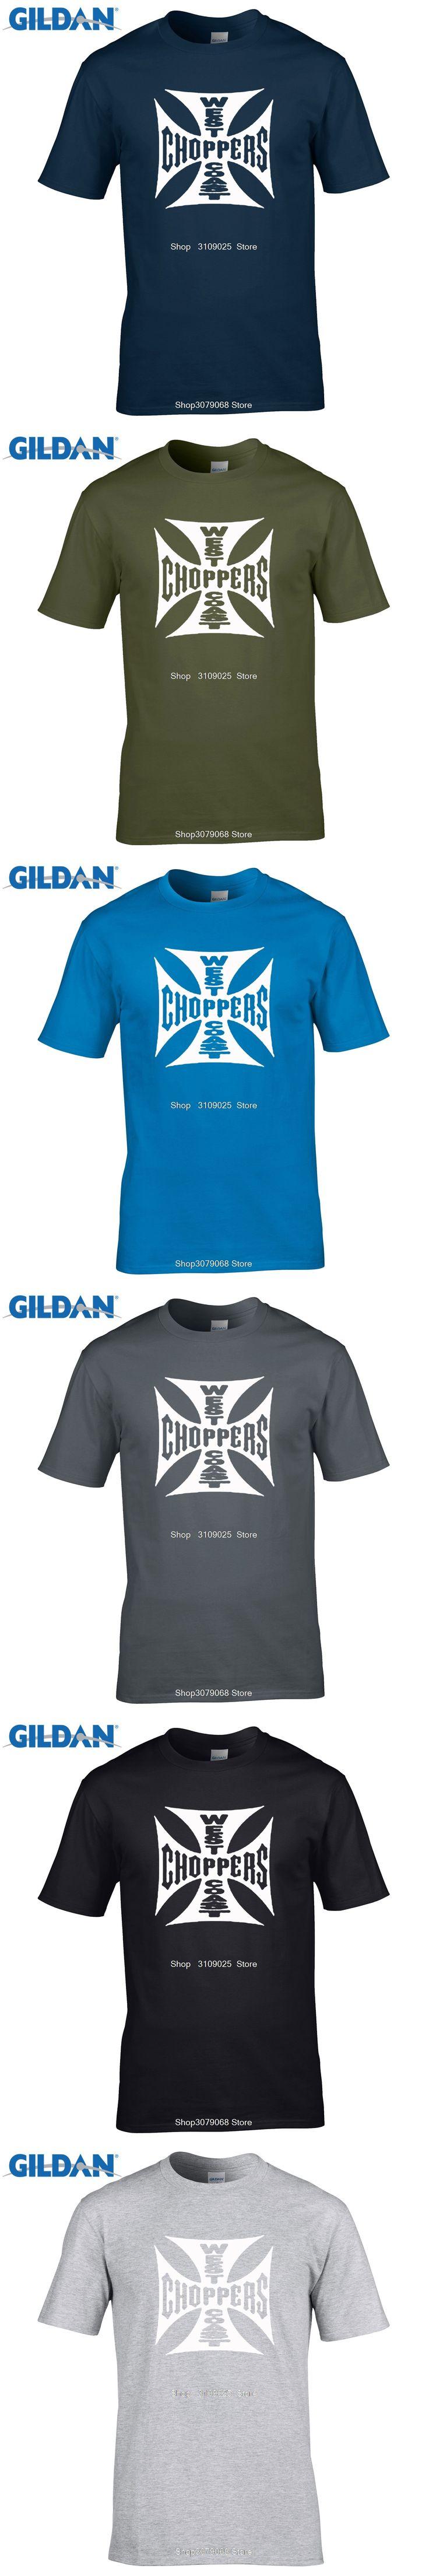 GILDAN New Furious 7 Fashion Movie Black Men T Shirt Paul Walker Collection Customized Short Sleeve Iron Cross Men T-shirts